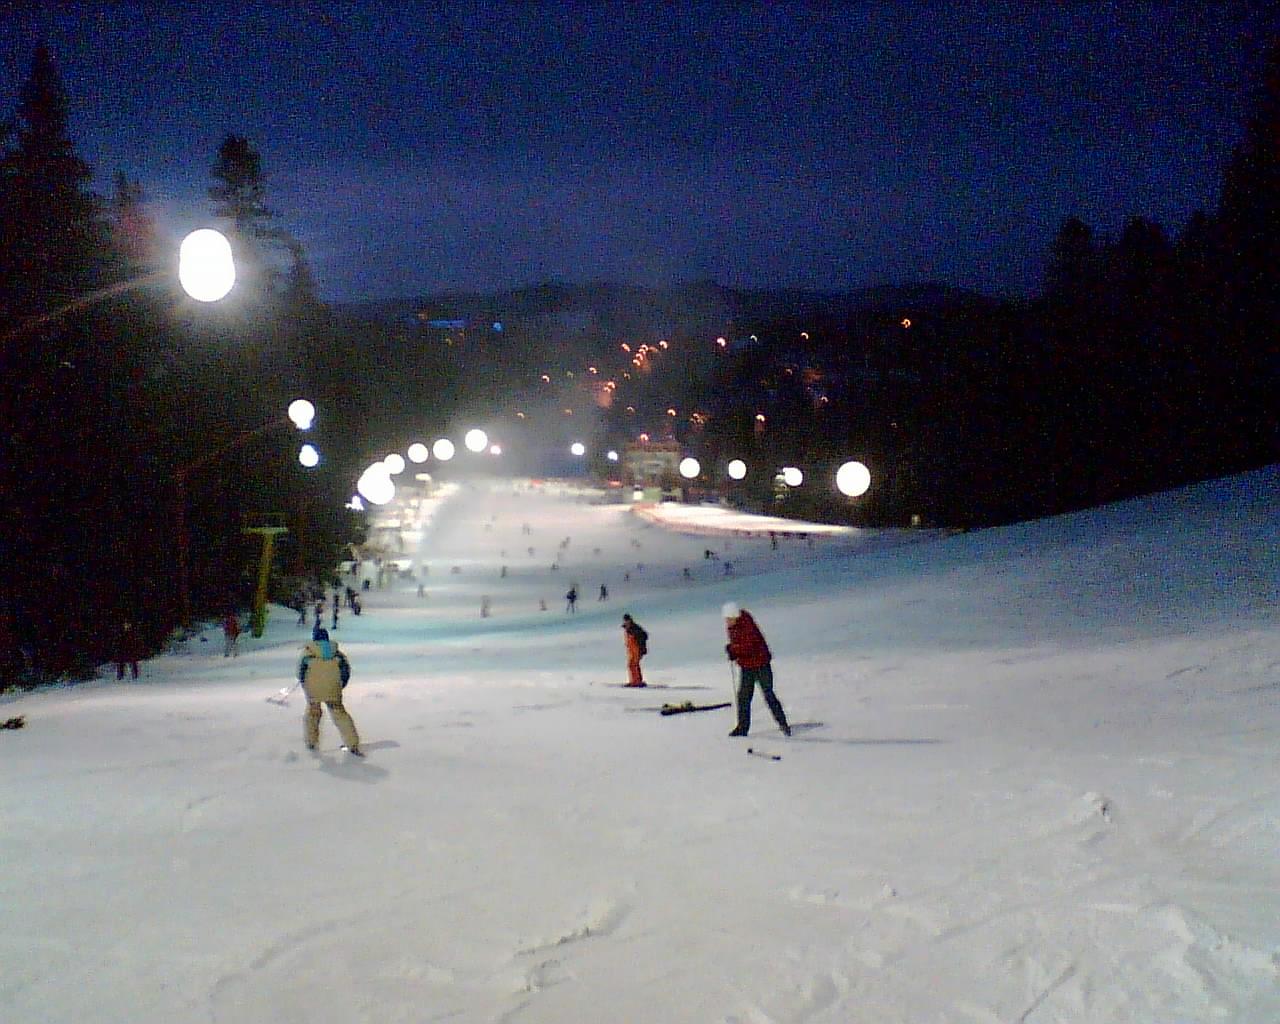 Night Skiing, Poiana Brasov